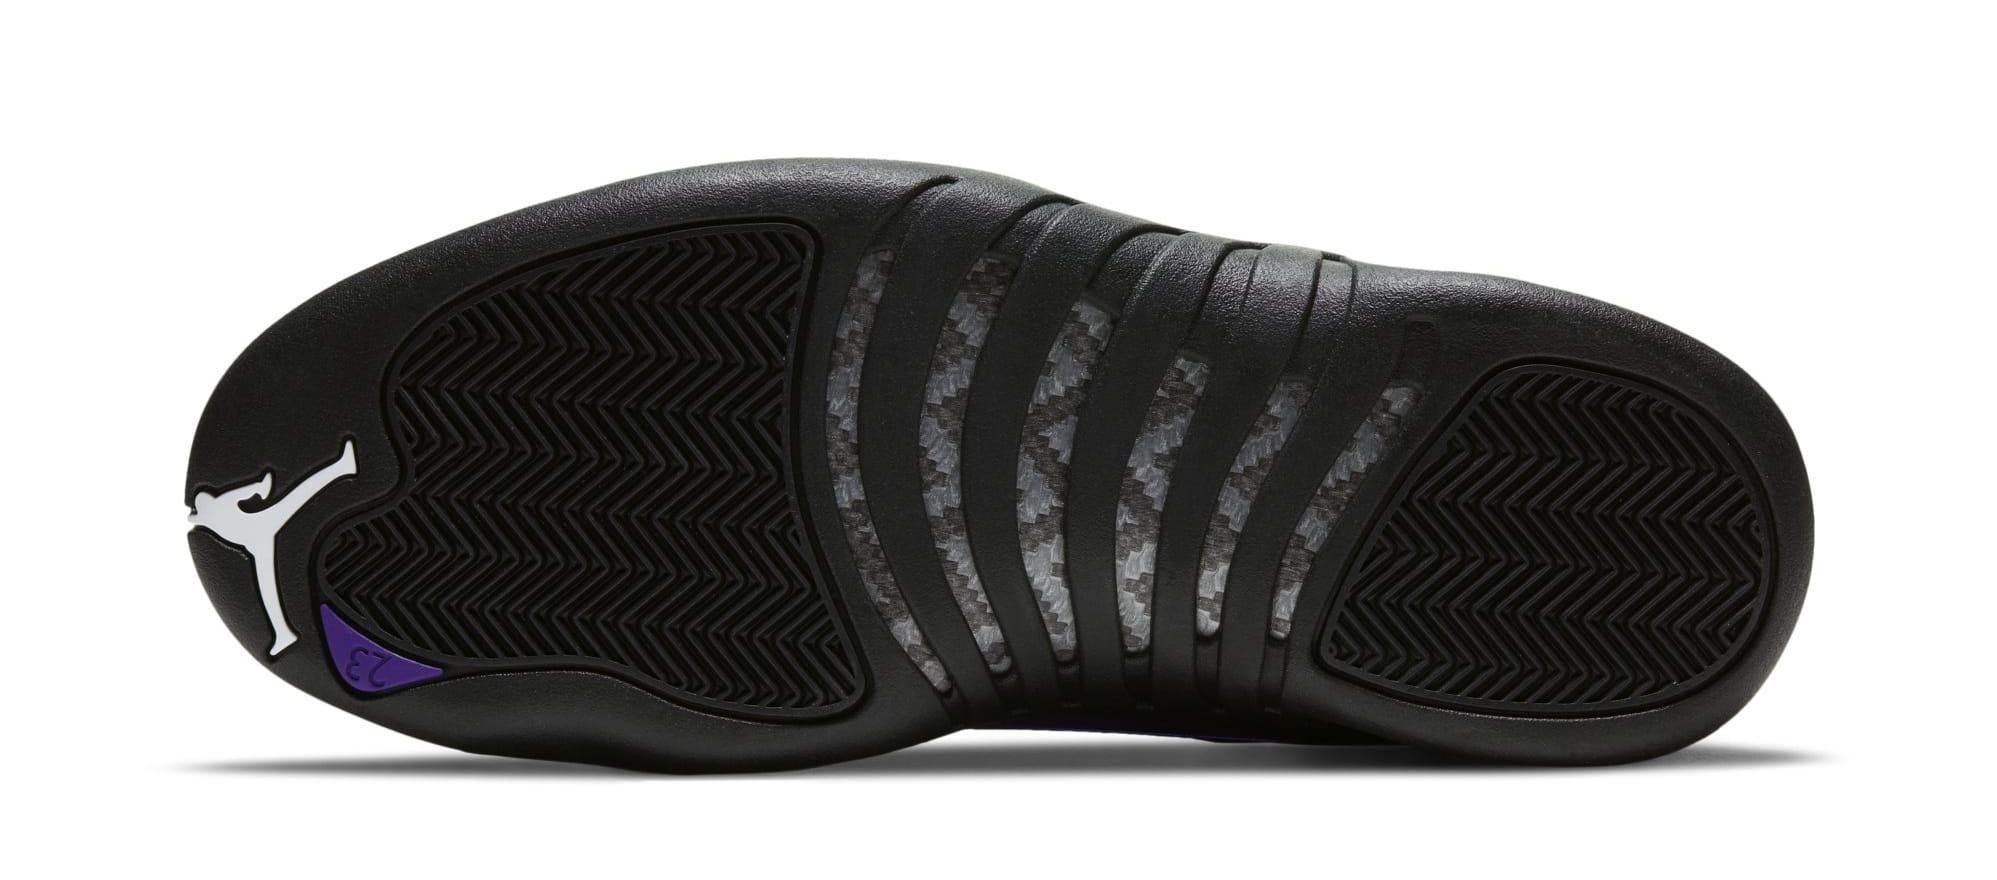 Air Jordan 12 Retro 'Black/Black/Dark Concord' CT8013-005 (Sole)